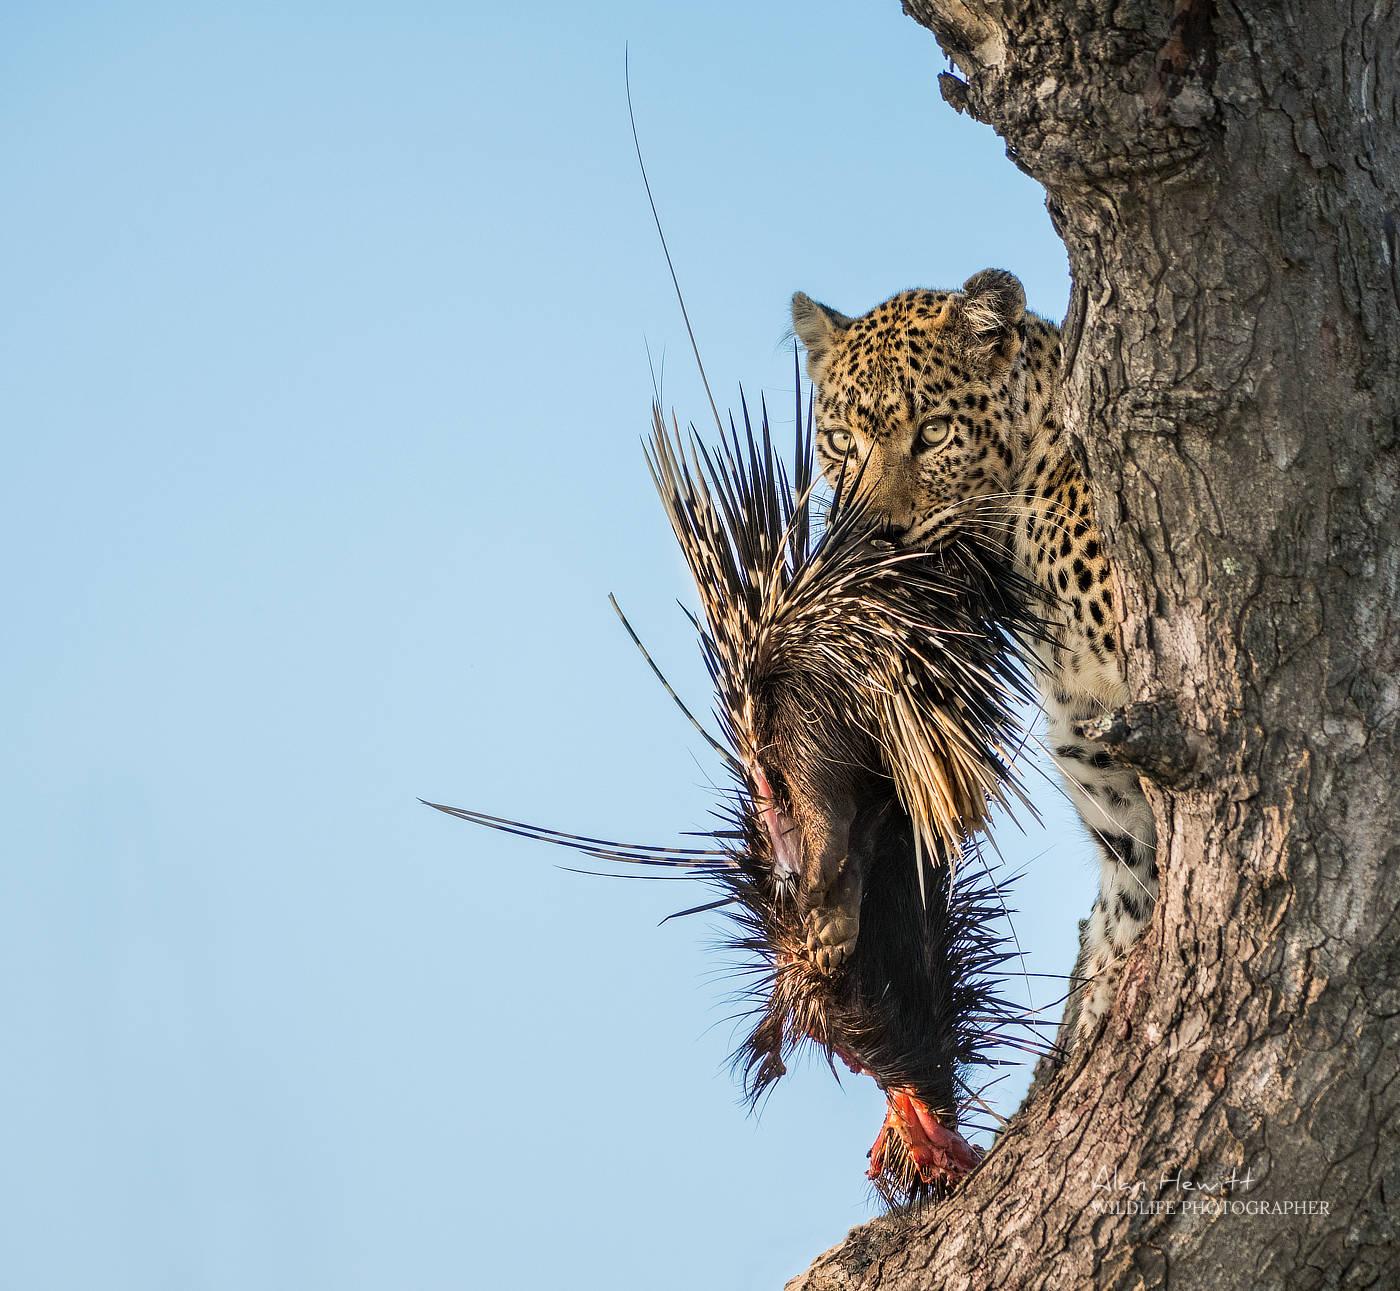 Leopard & Porcupine Alan Hewitt Photography